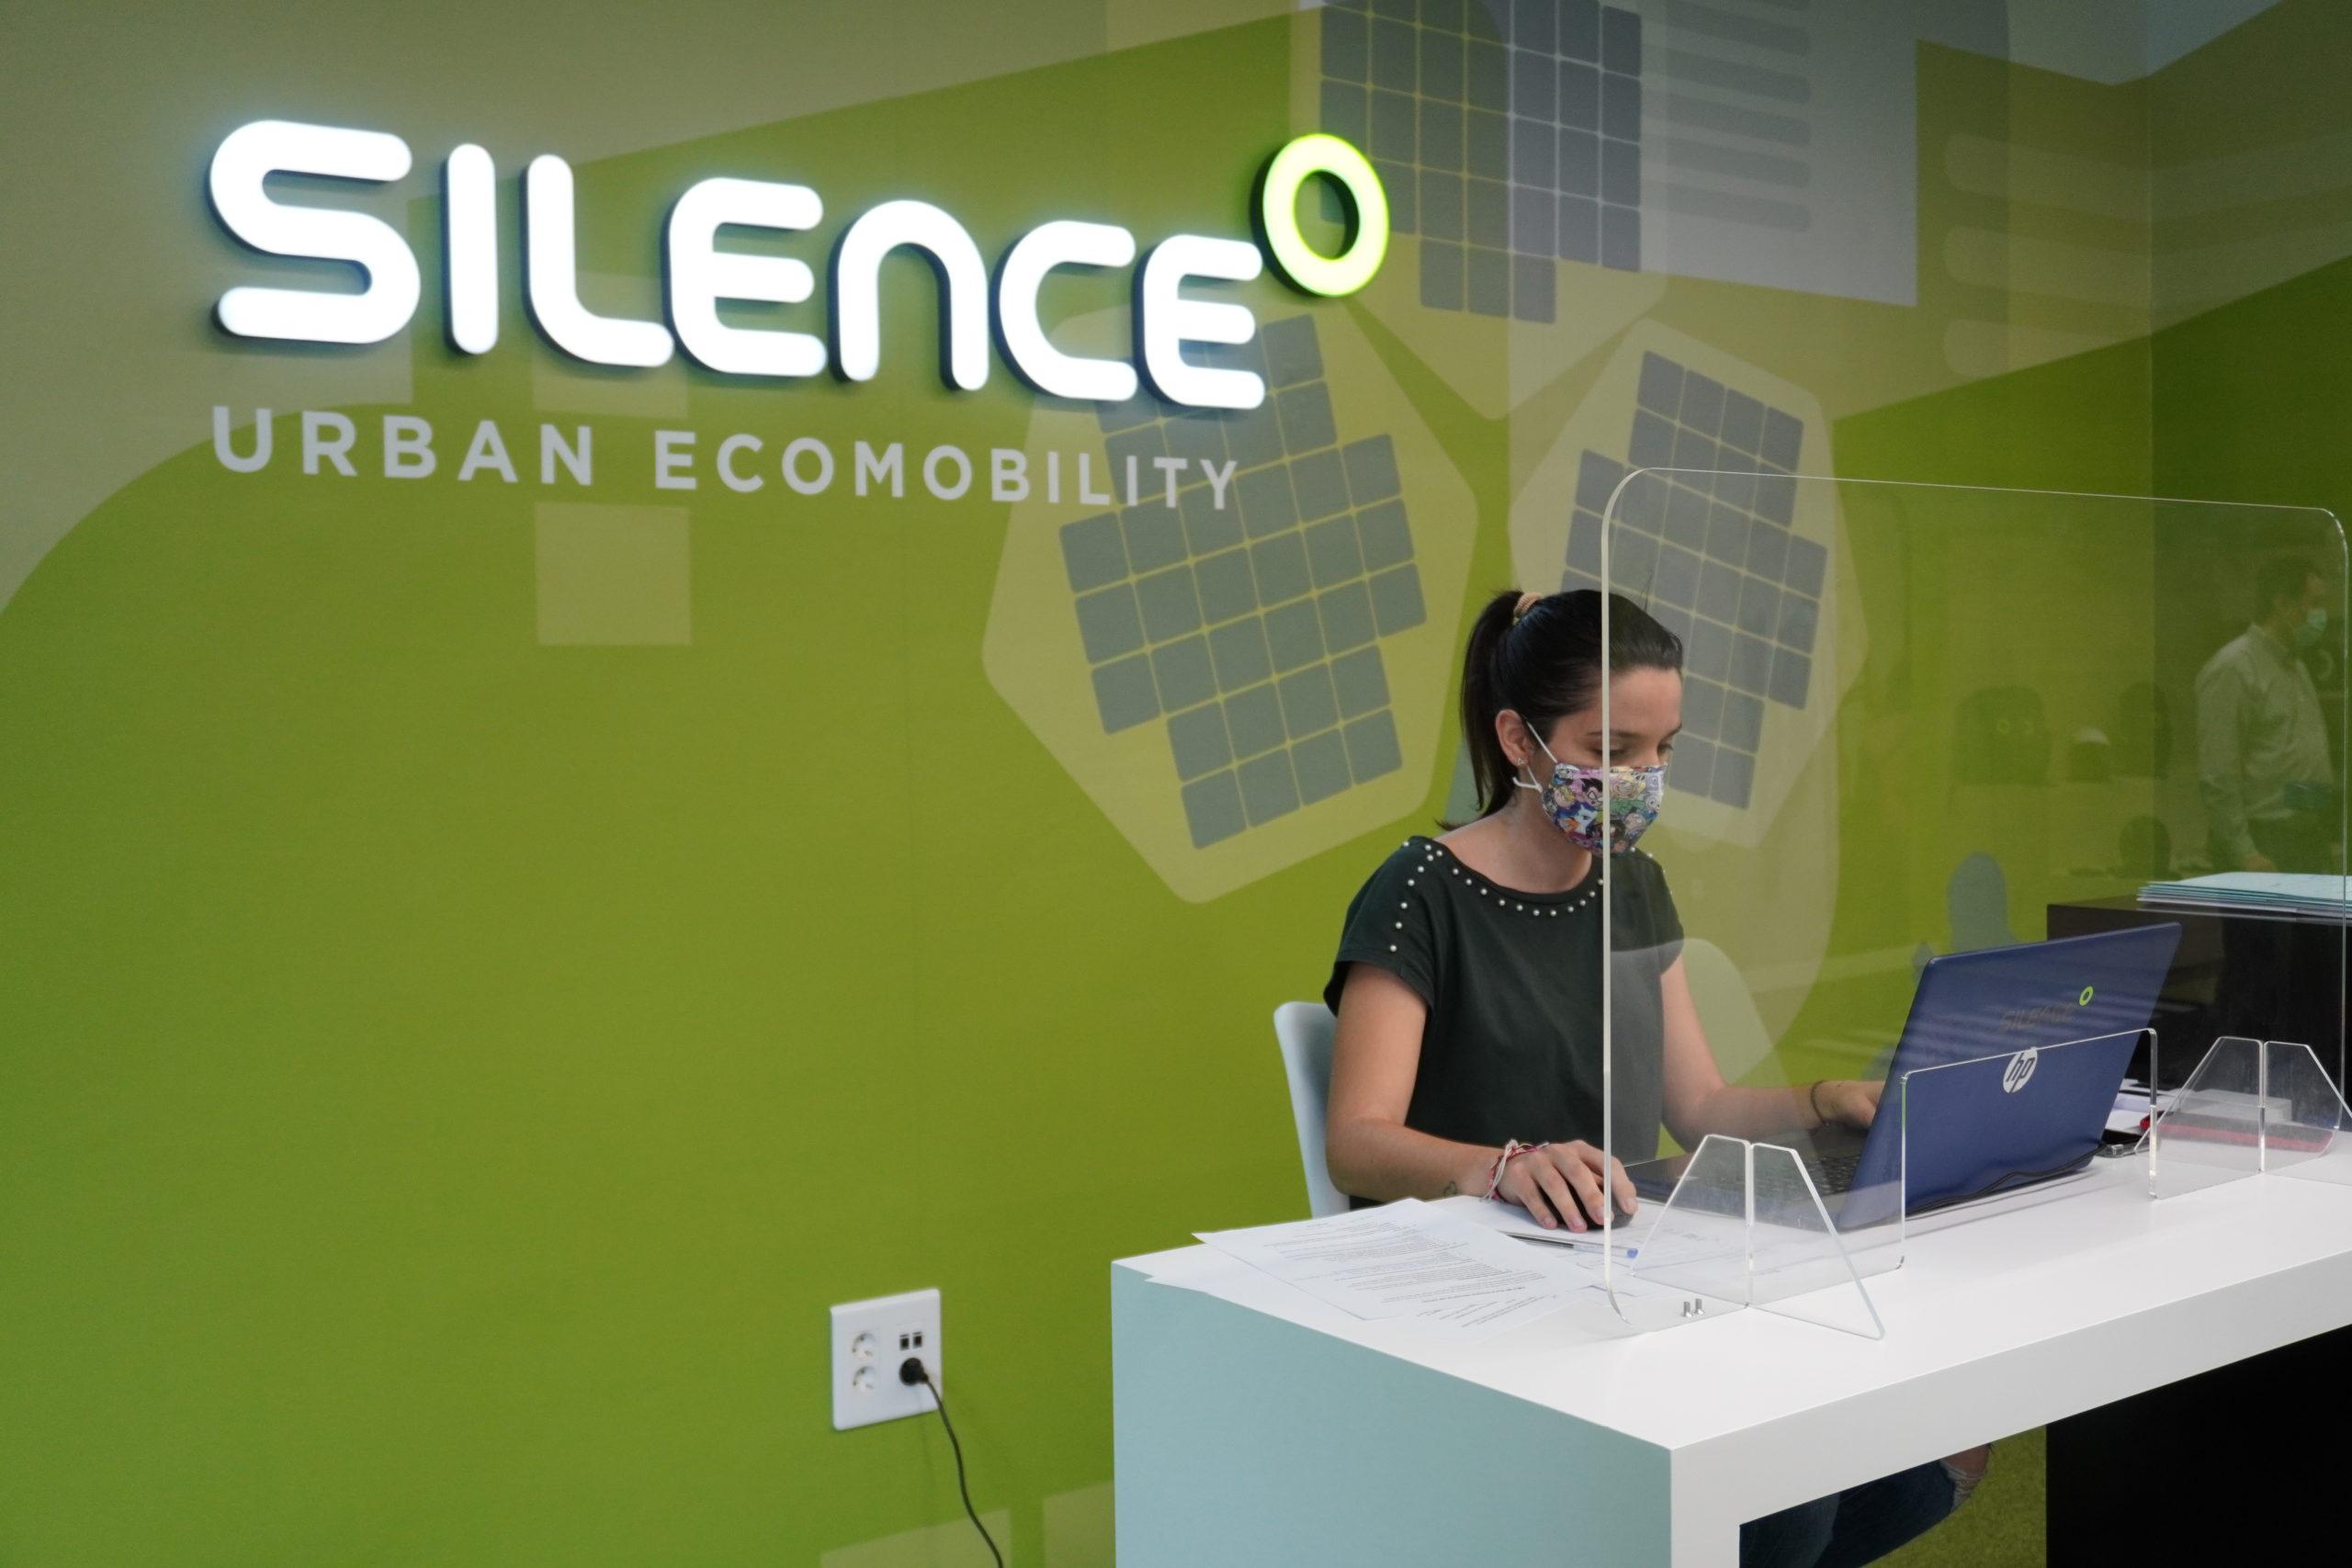 Silence llega a Valencia de la mano de J.R. Valle 2